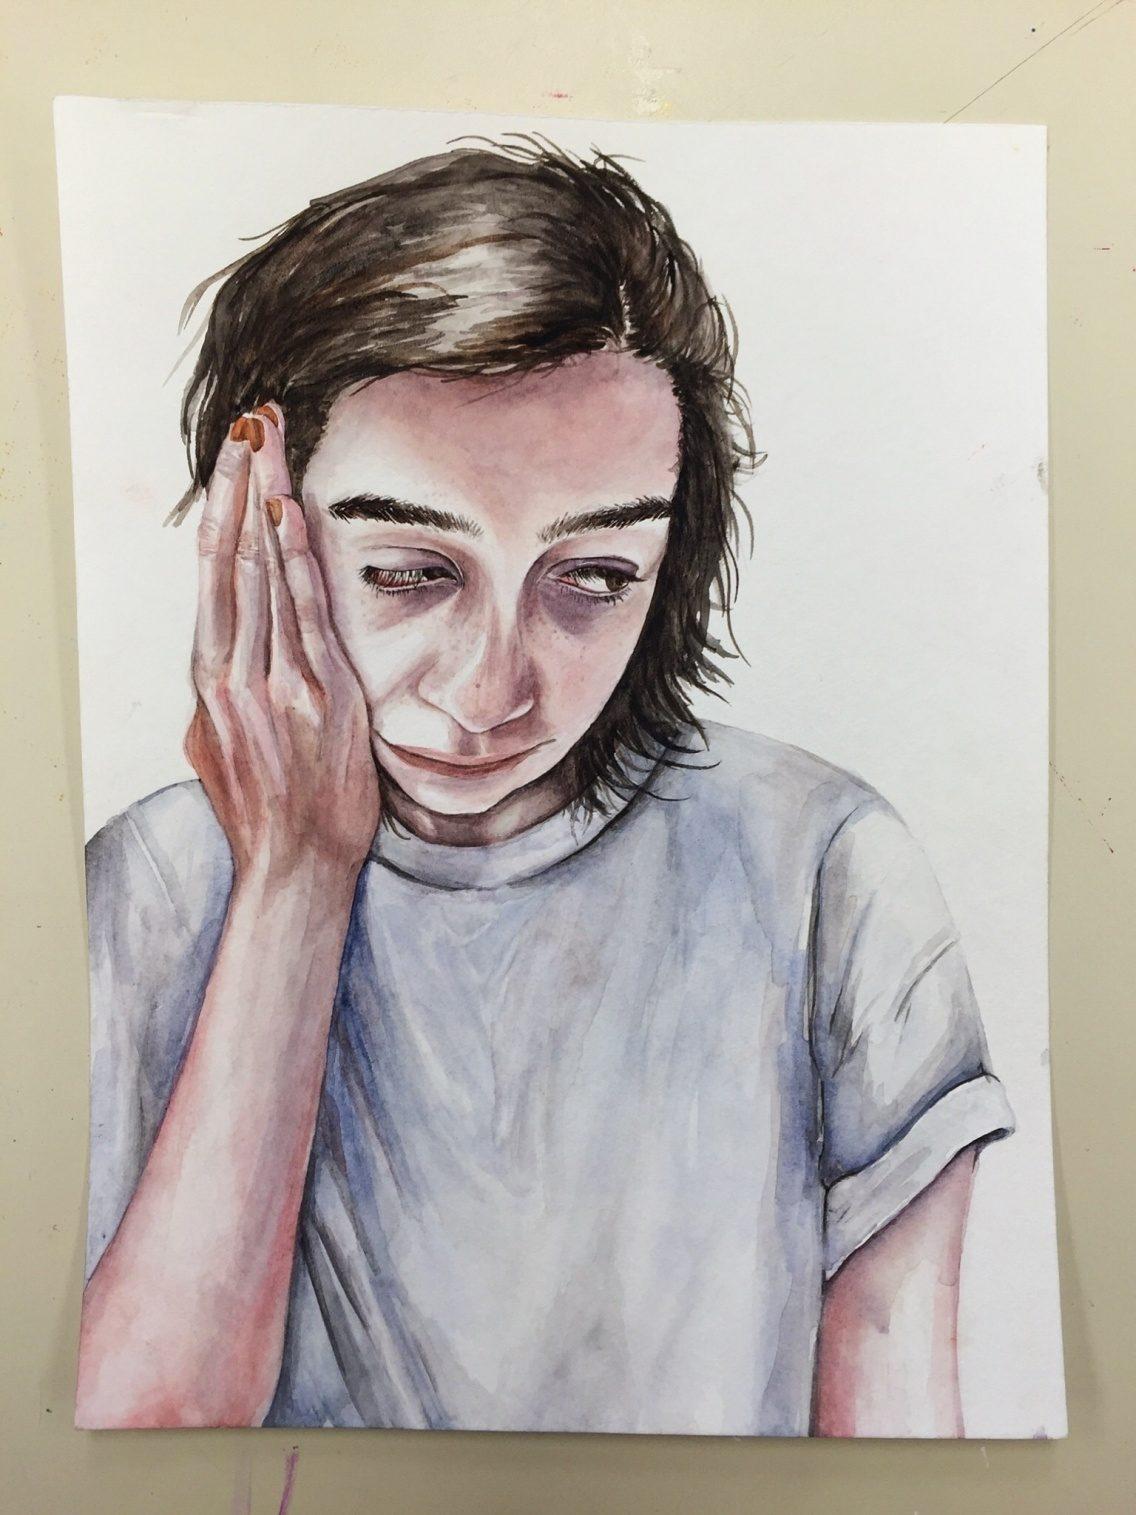 Artwork by Eliza Jame